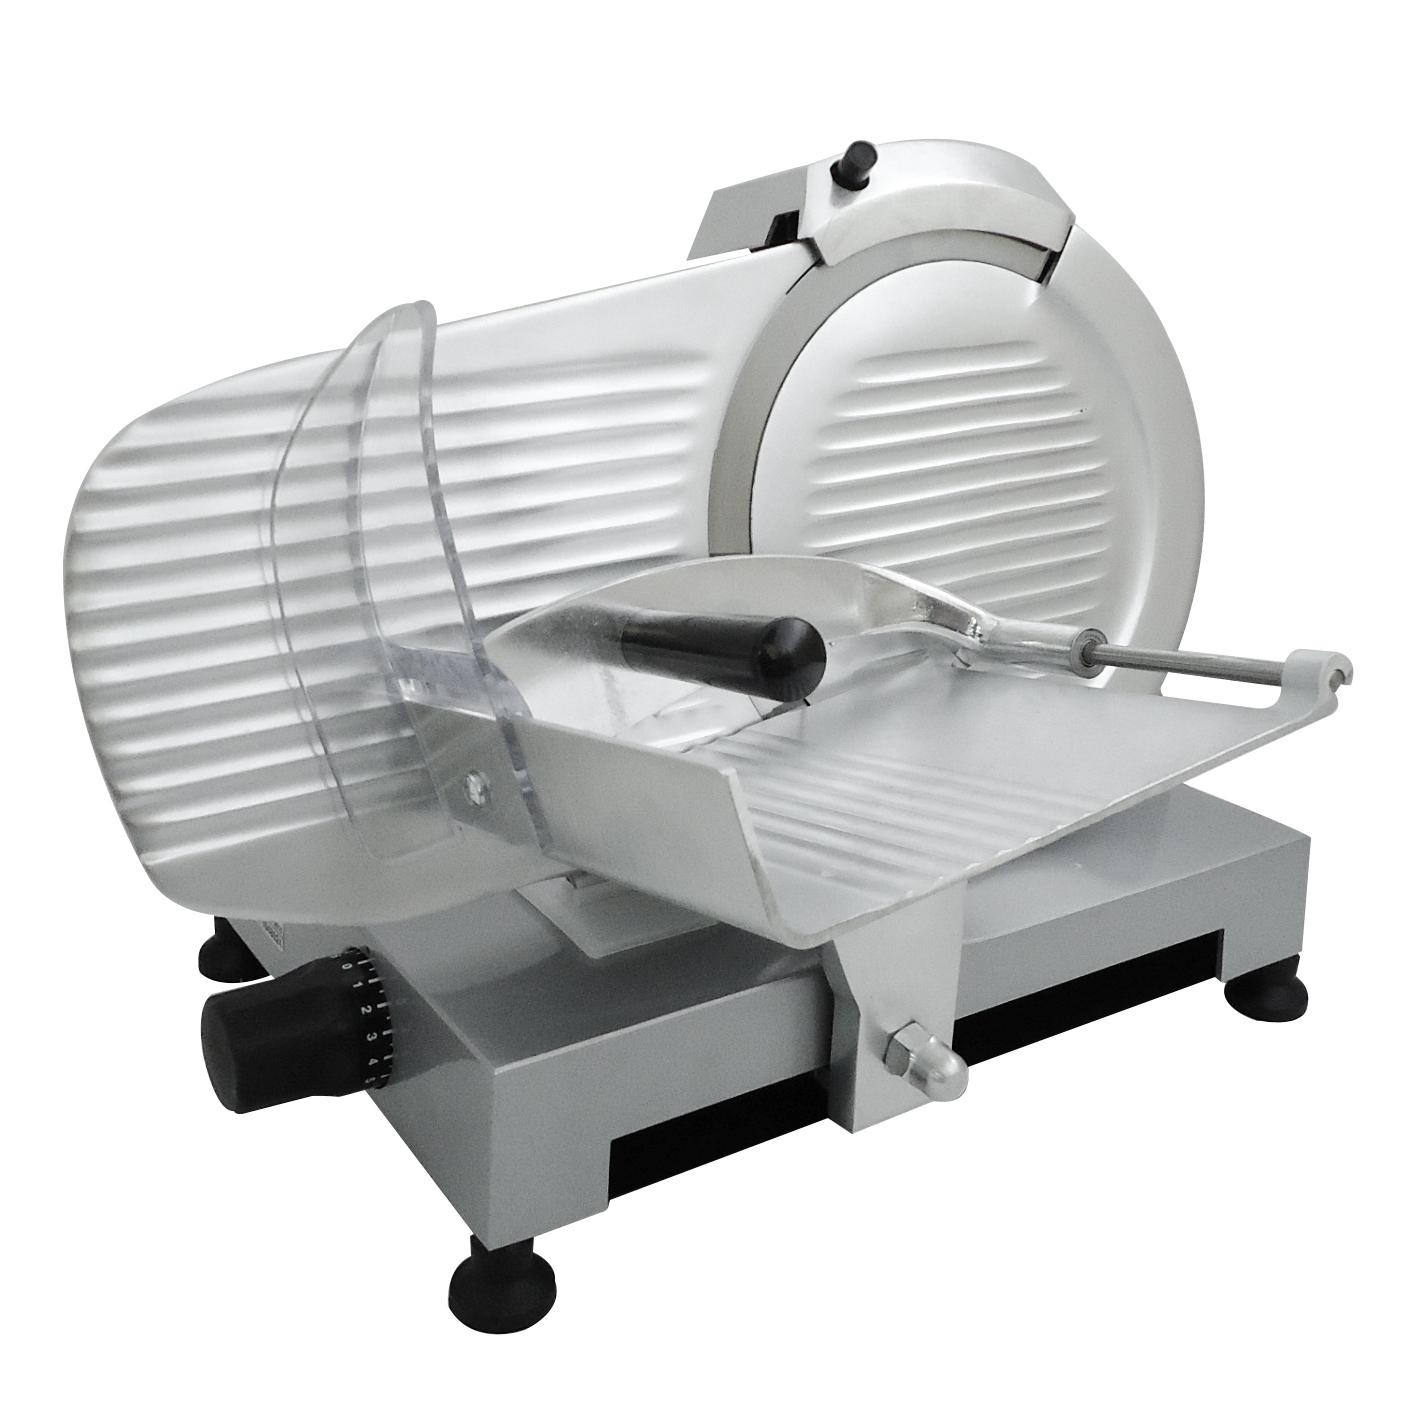 ESSEDUE 250C Ζαμπονομηχανή Πλάγιας Κοπής Με Ιμάντες - Διάμετρος Μαχαιριού: 250mm black week προσφορές   ζαμπονομηχανές  επαγγελματικός εξοπλισμός   συσκευές επεξ